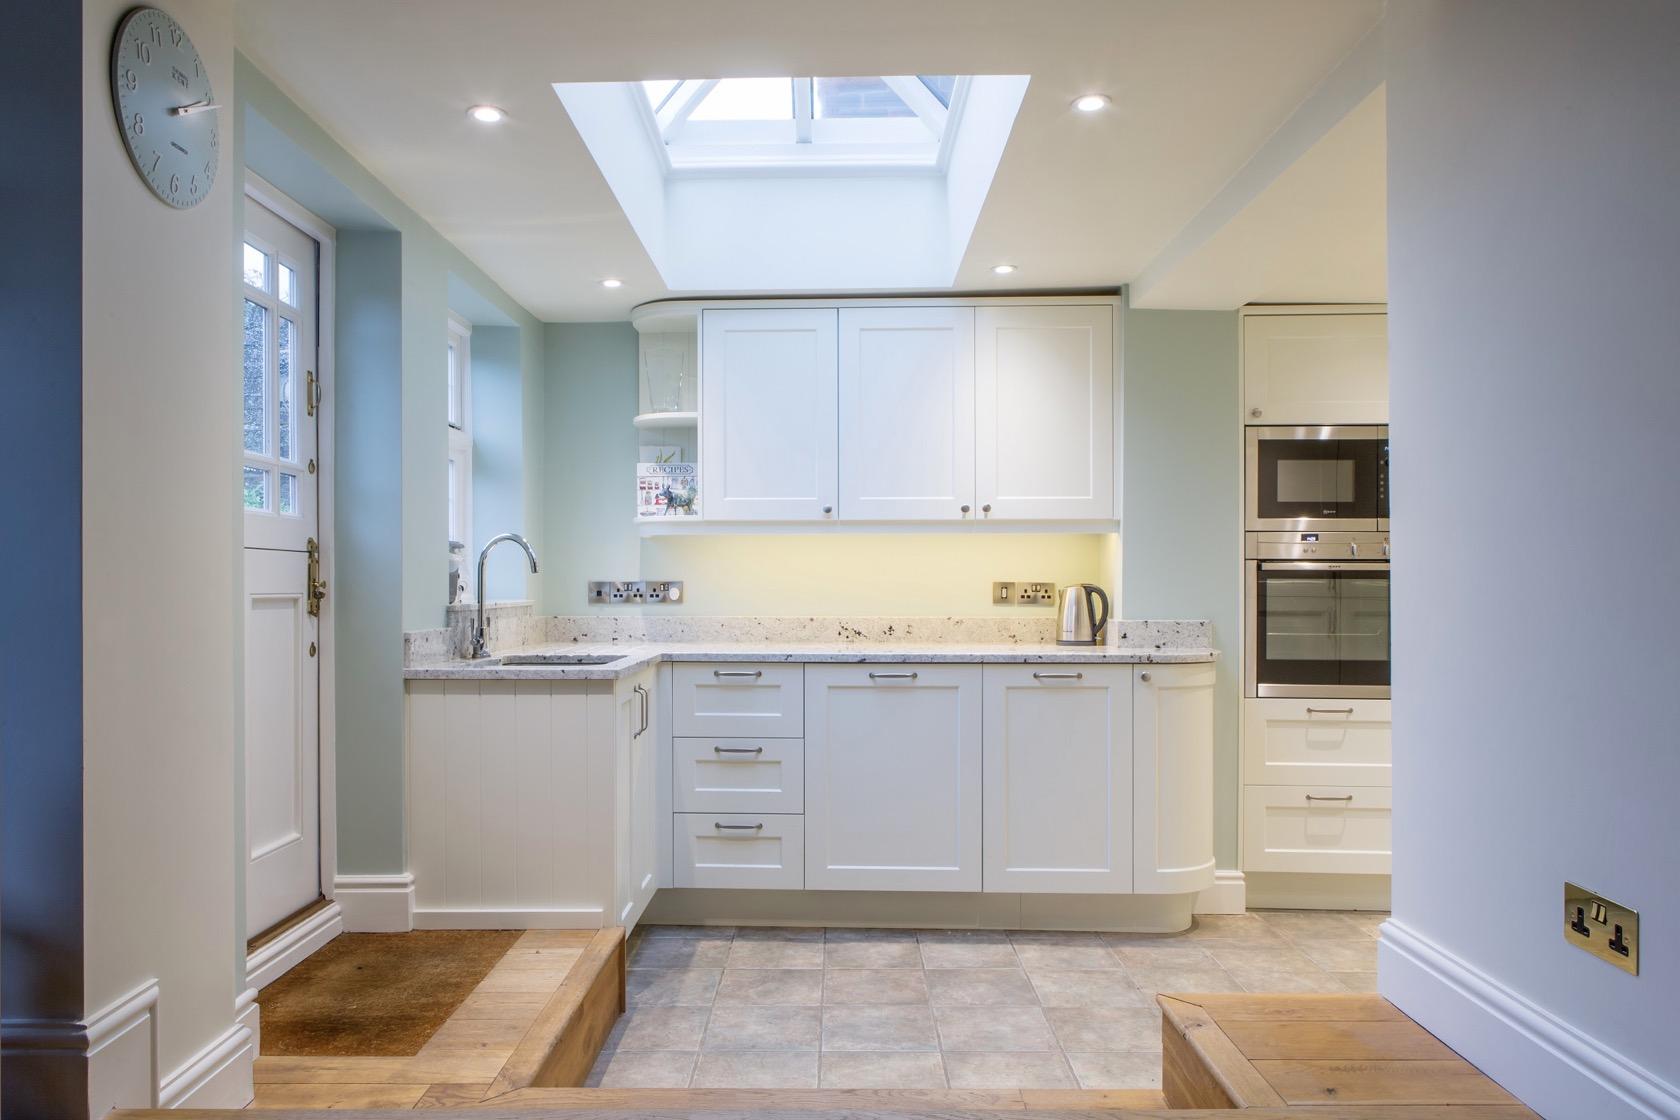 handpainted kitchen with skylight kingsey longwick buckinghamshire 1